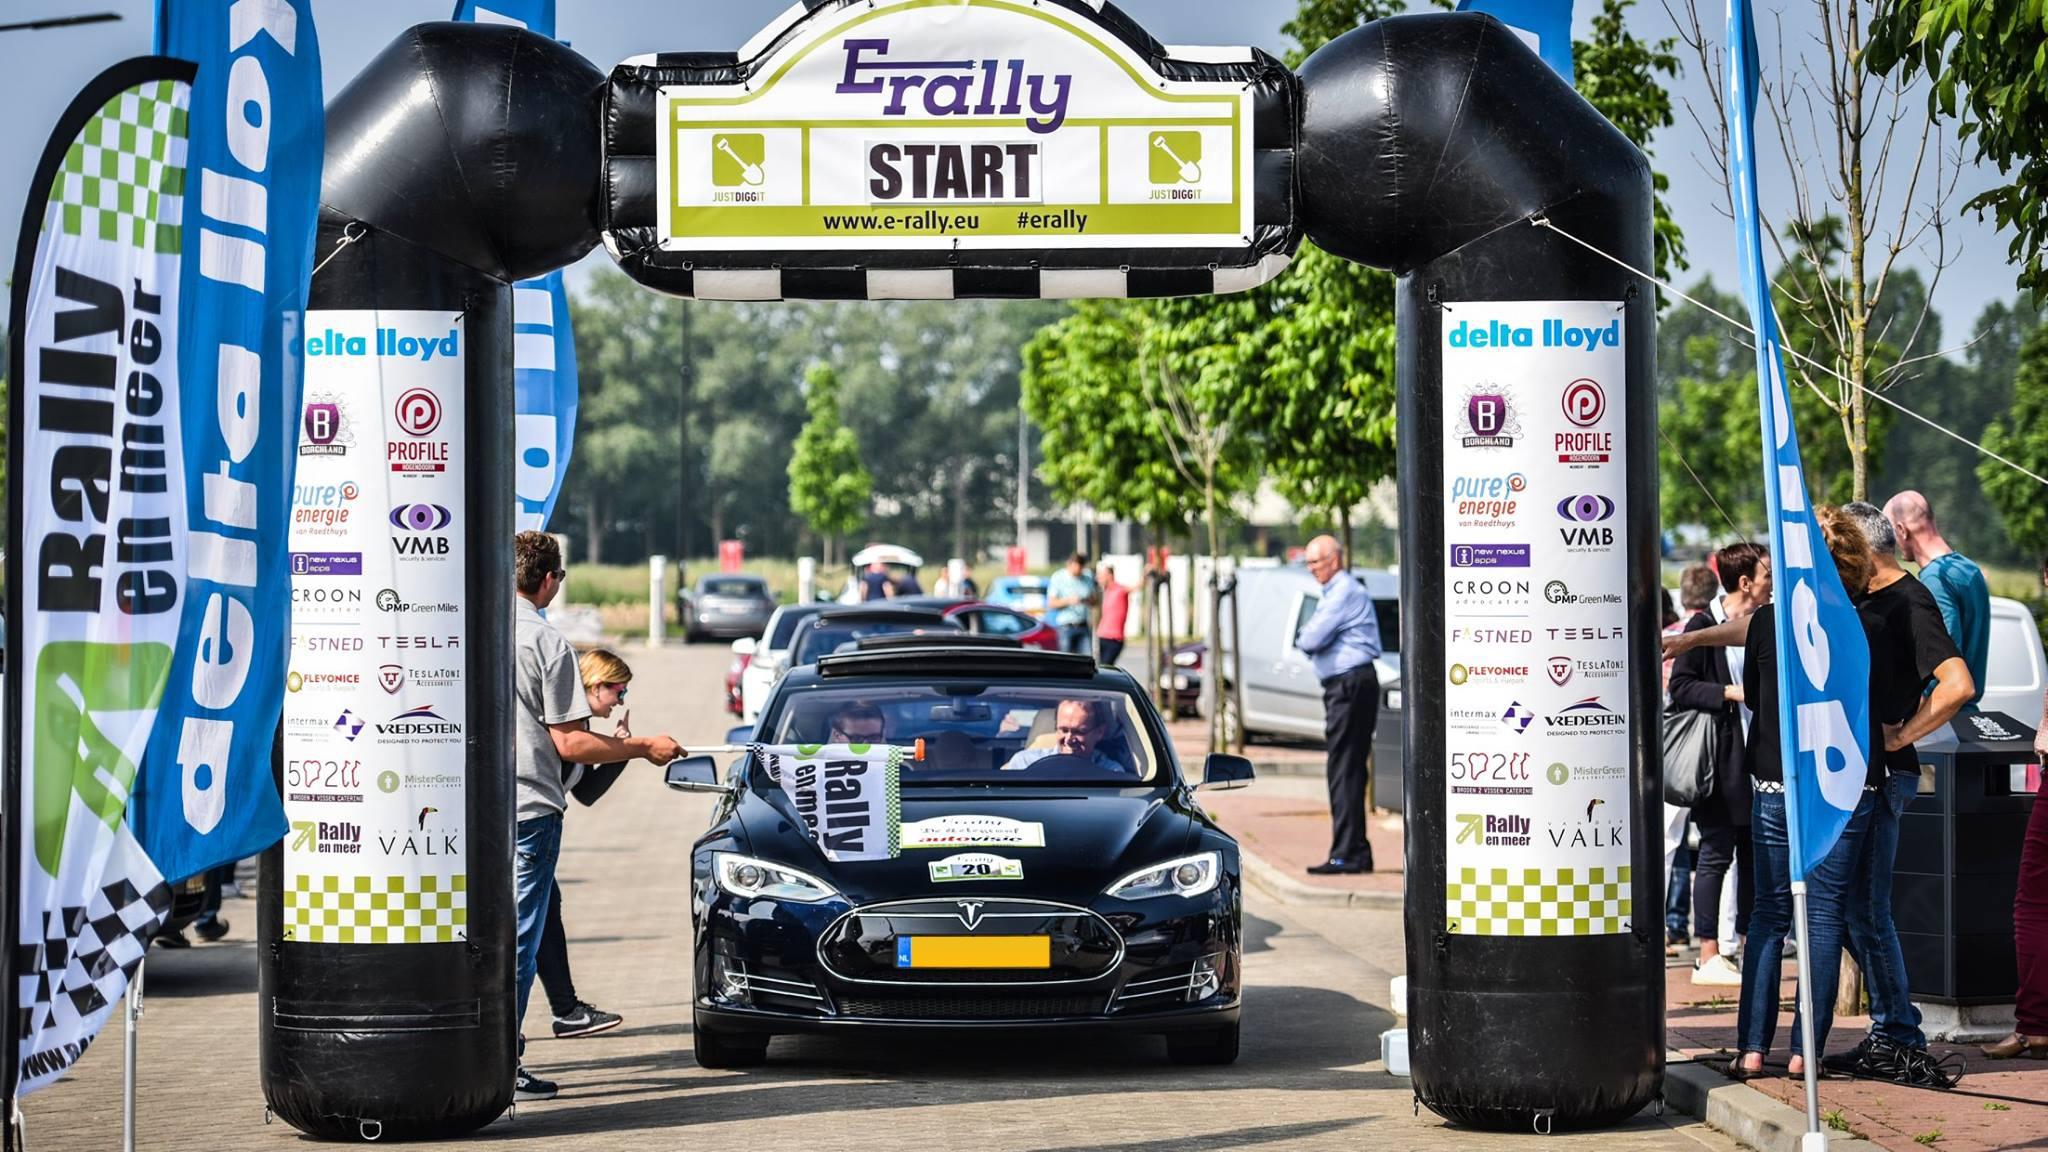 Stichting E-Rally